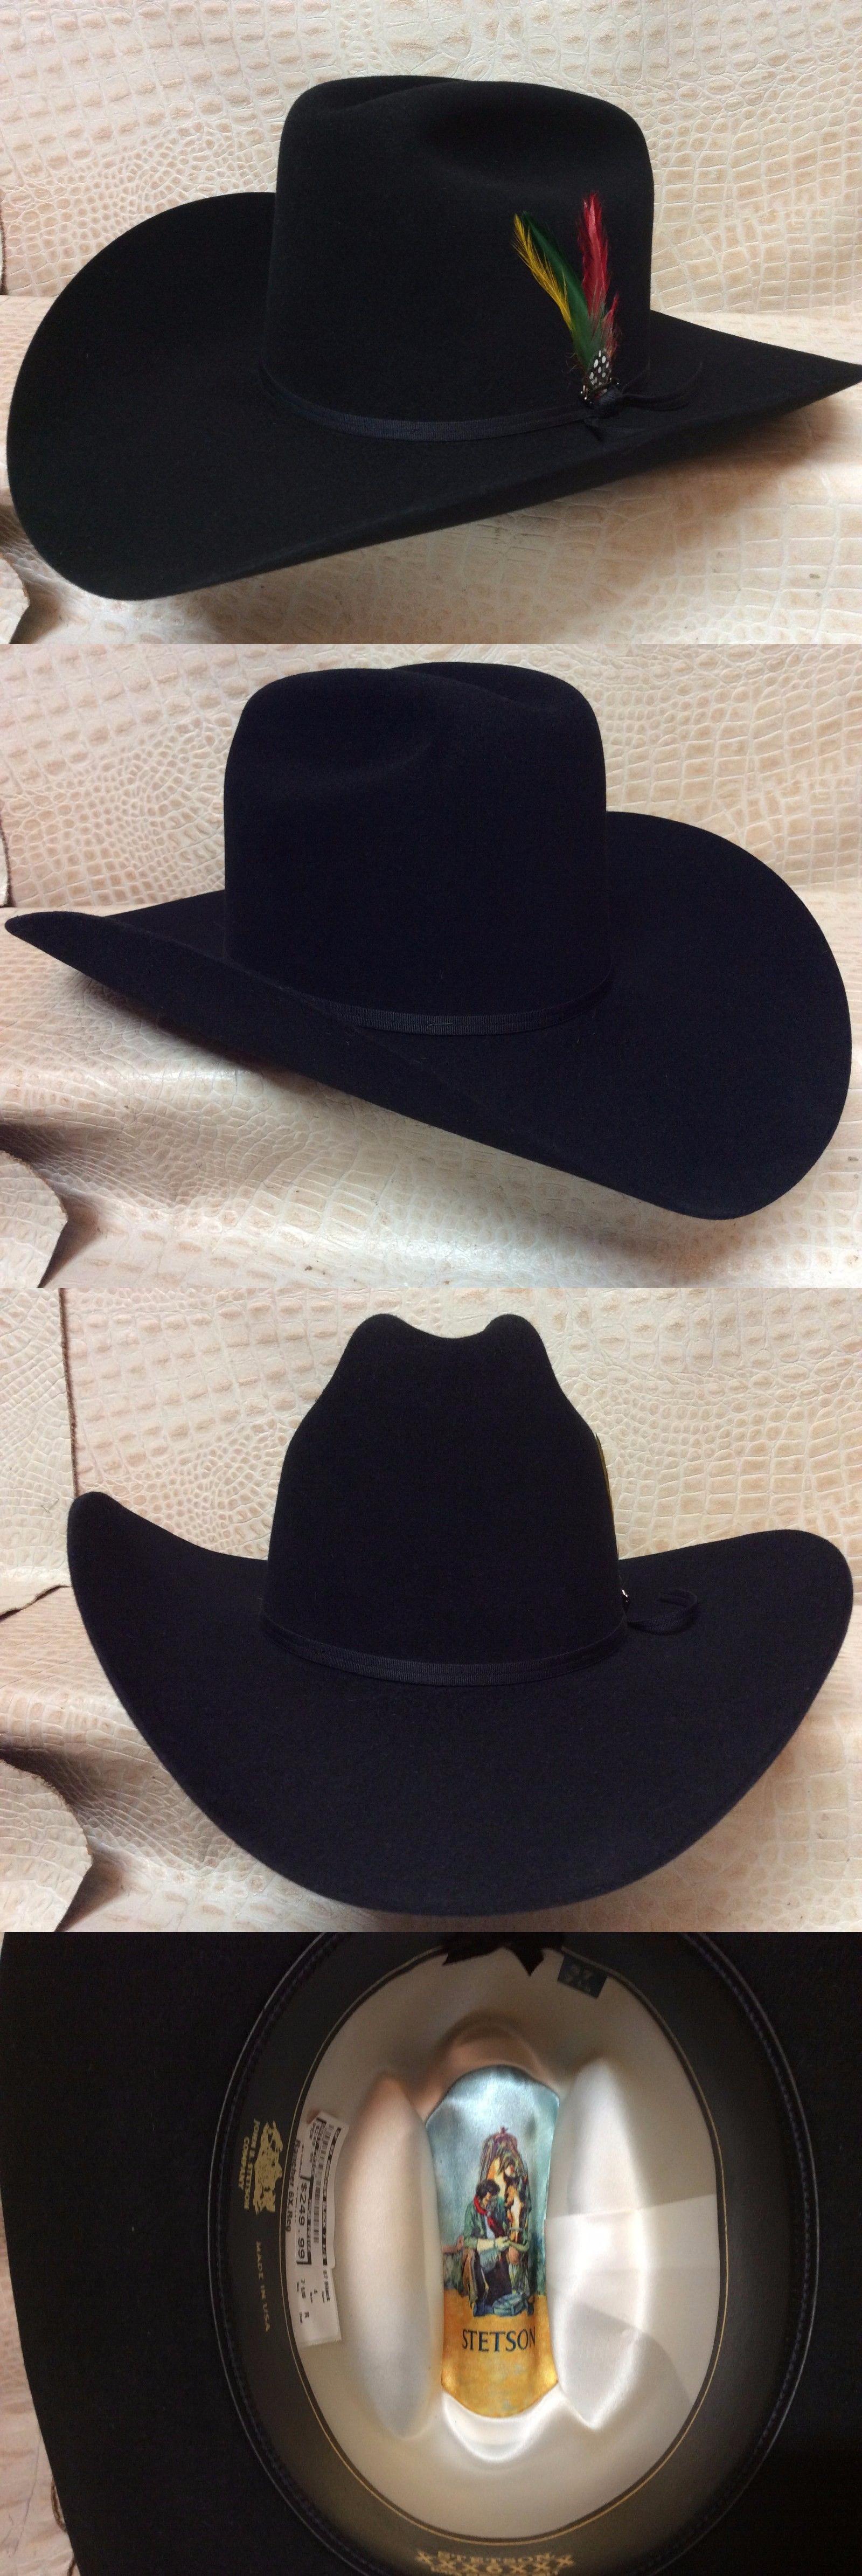 ba8f2994b86ac Hats 52365  New Stetson Rancher Black 6X Beaver Fur Felt Cowboy Hat -  BUY  IT NOW ONLY   215.99 on eBay!